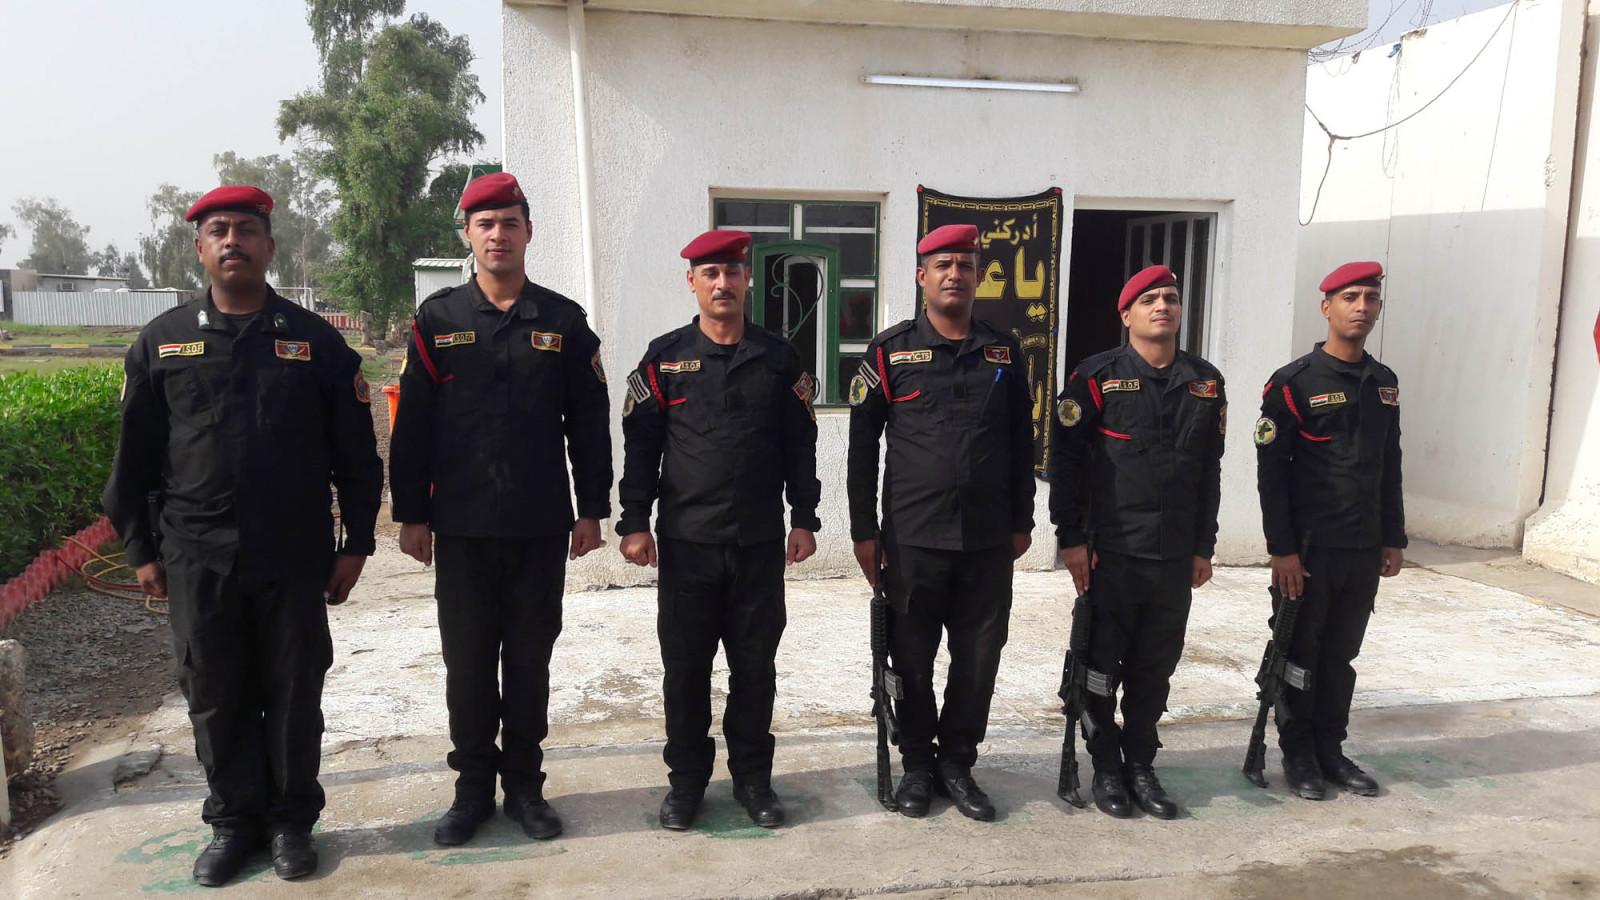 ISOF Black uniform Xpn59w